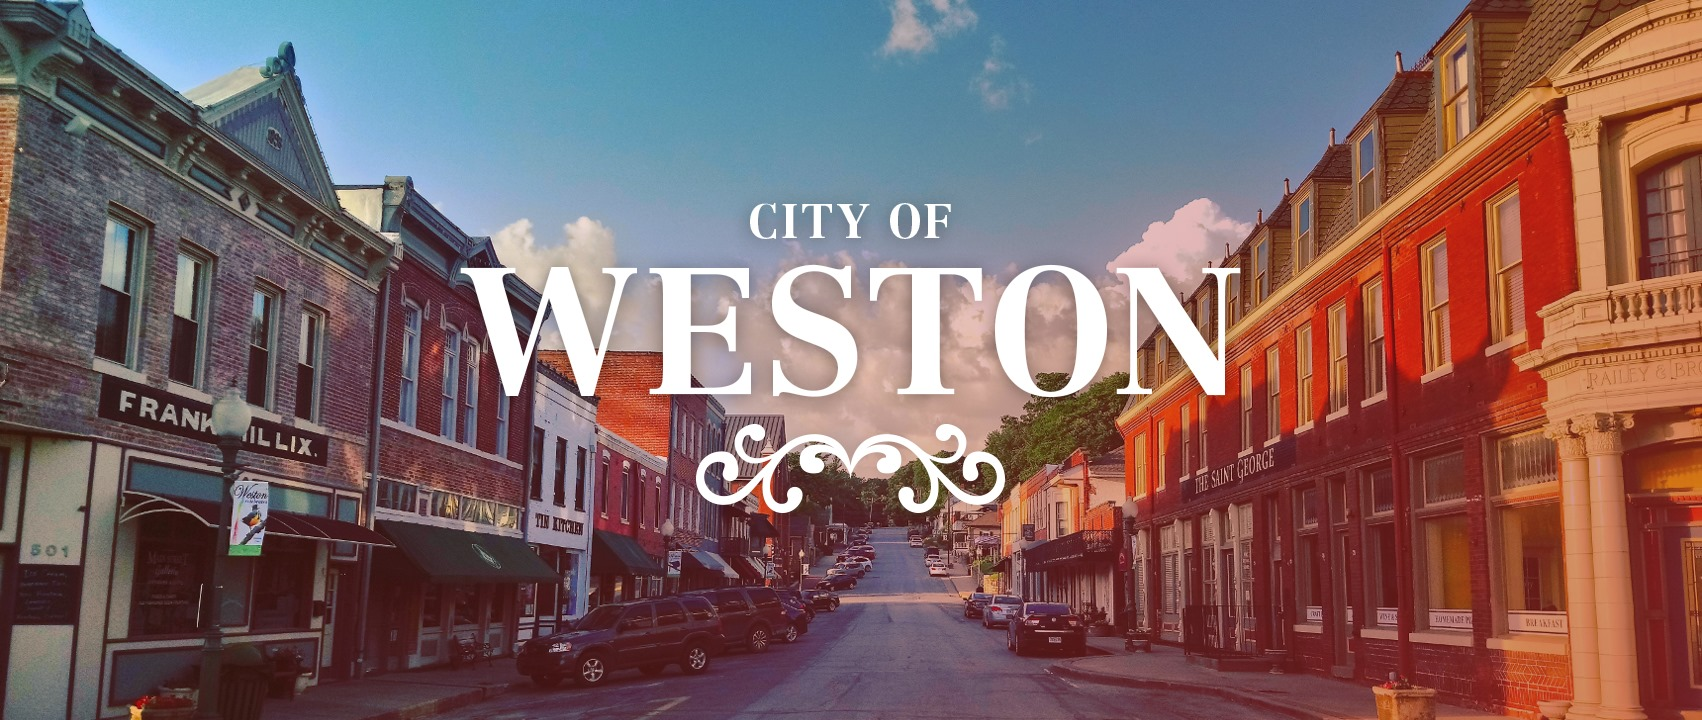 Downtown Weston Miccouri